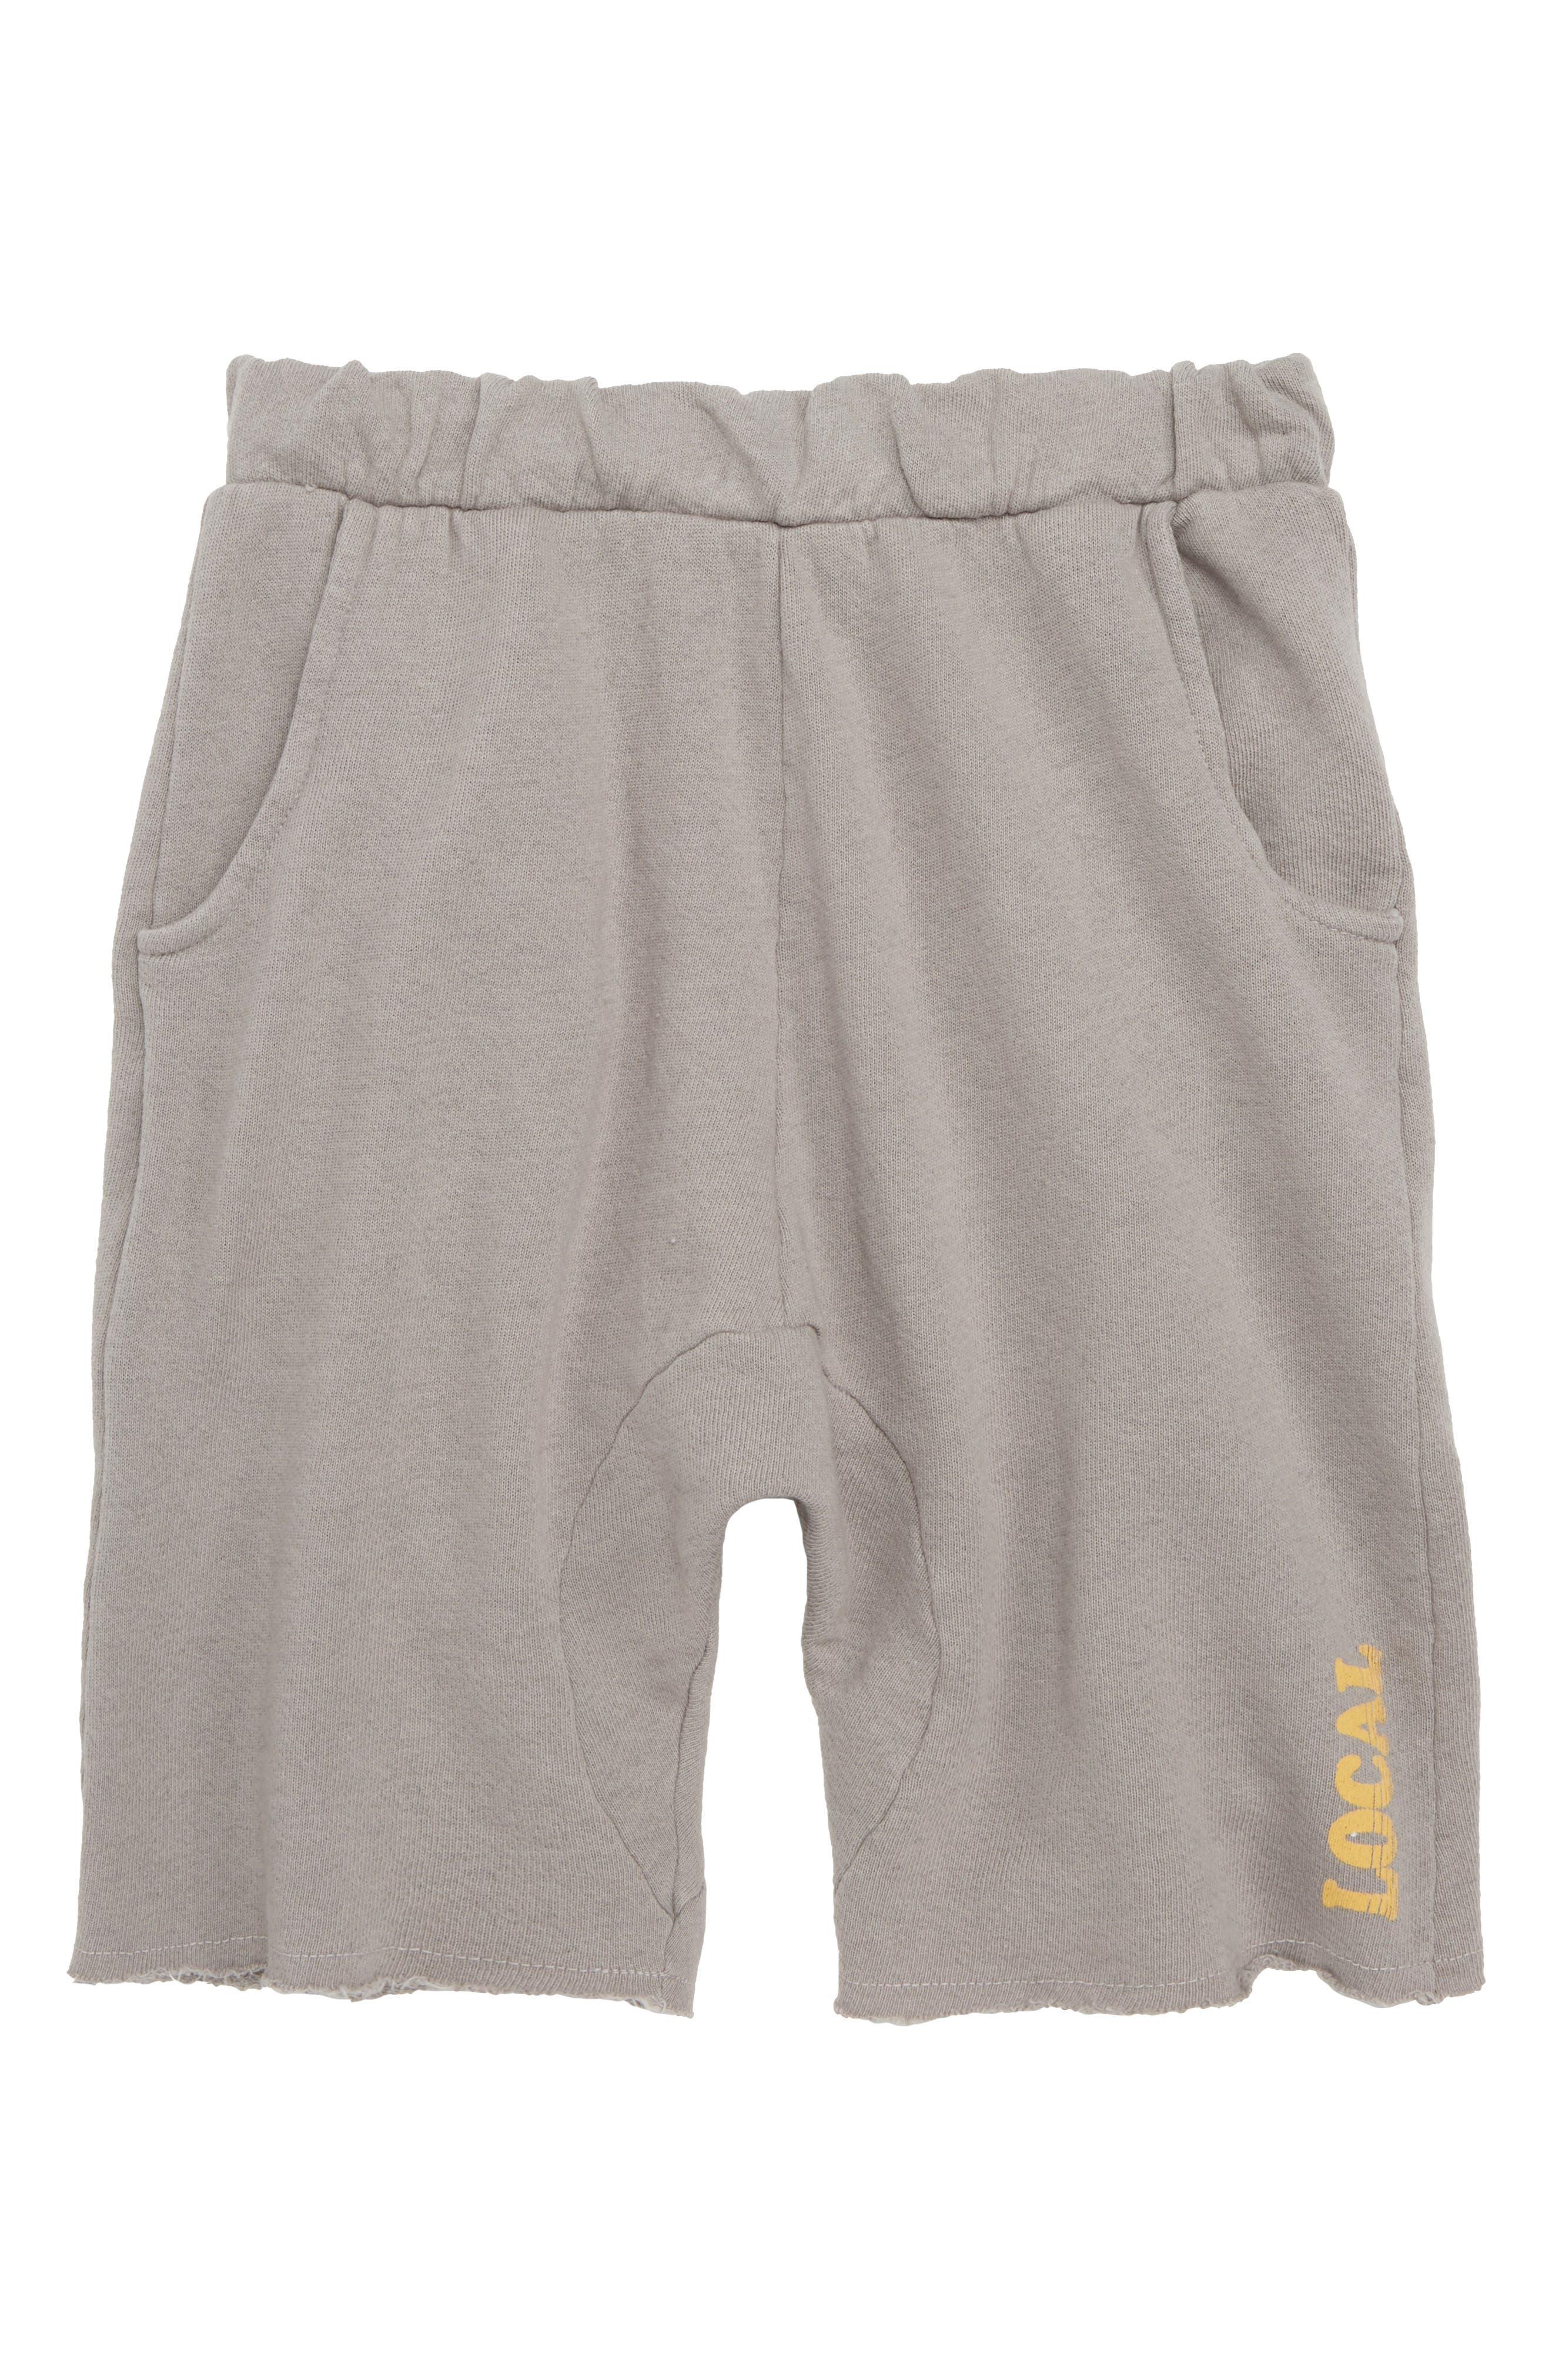 Cozy Time Shorts,                             Main thumbnail 2, color,